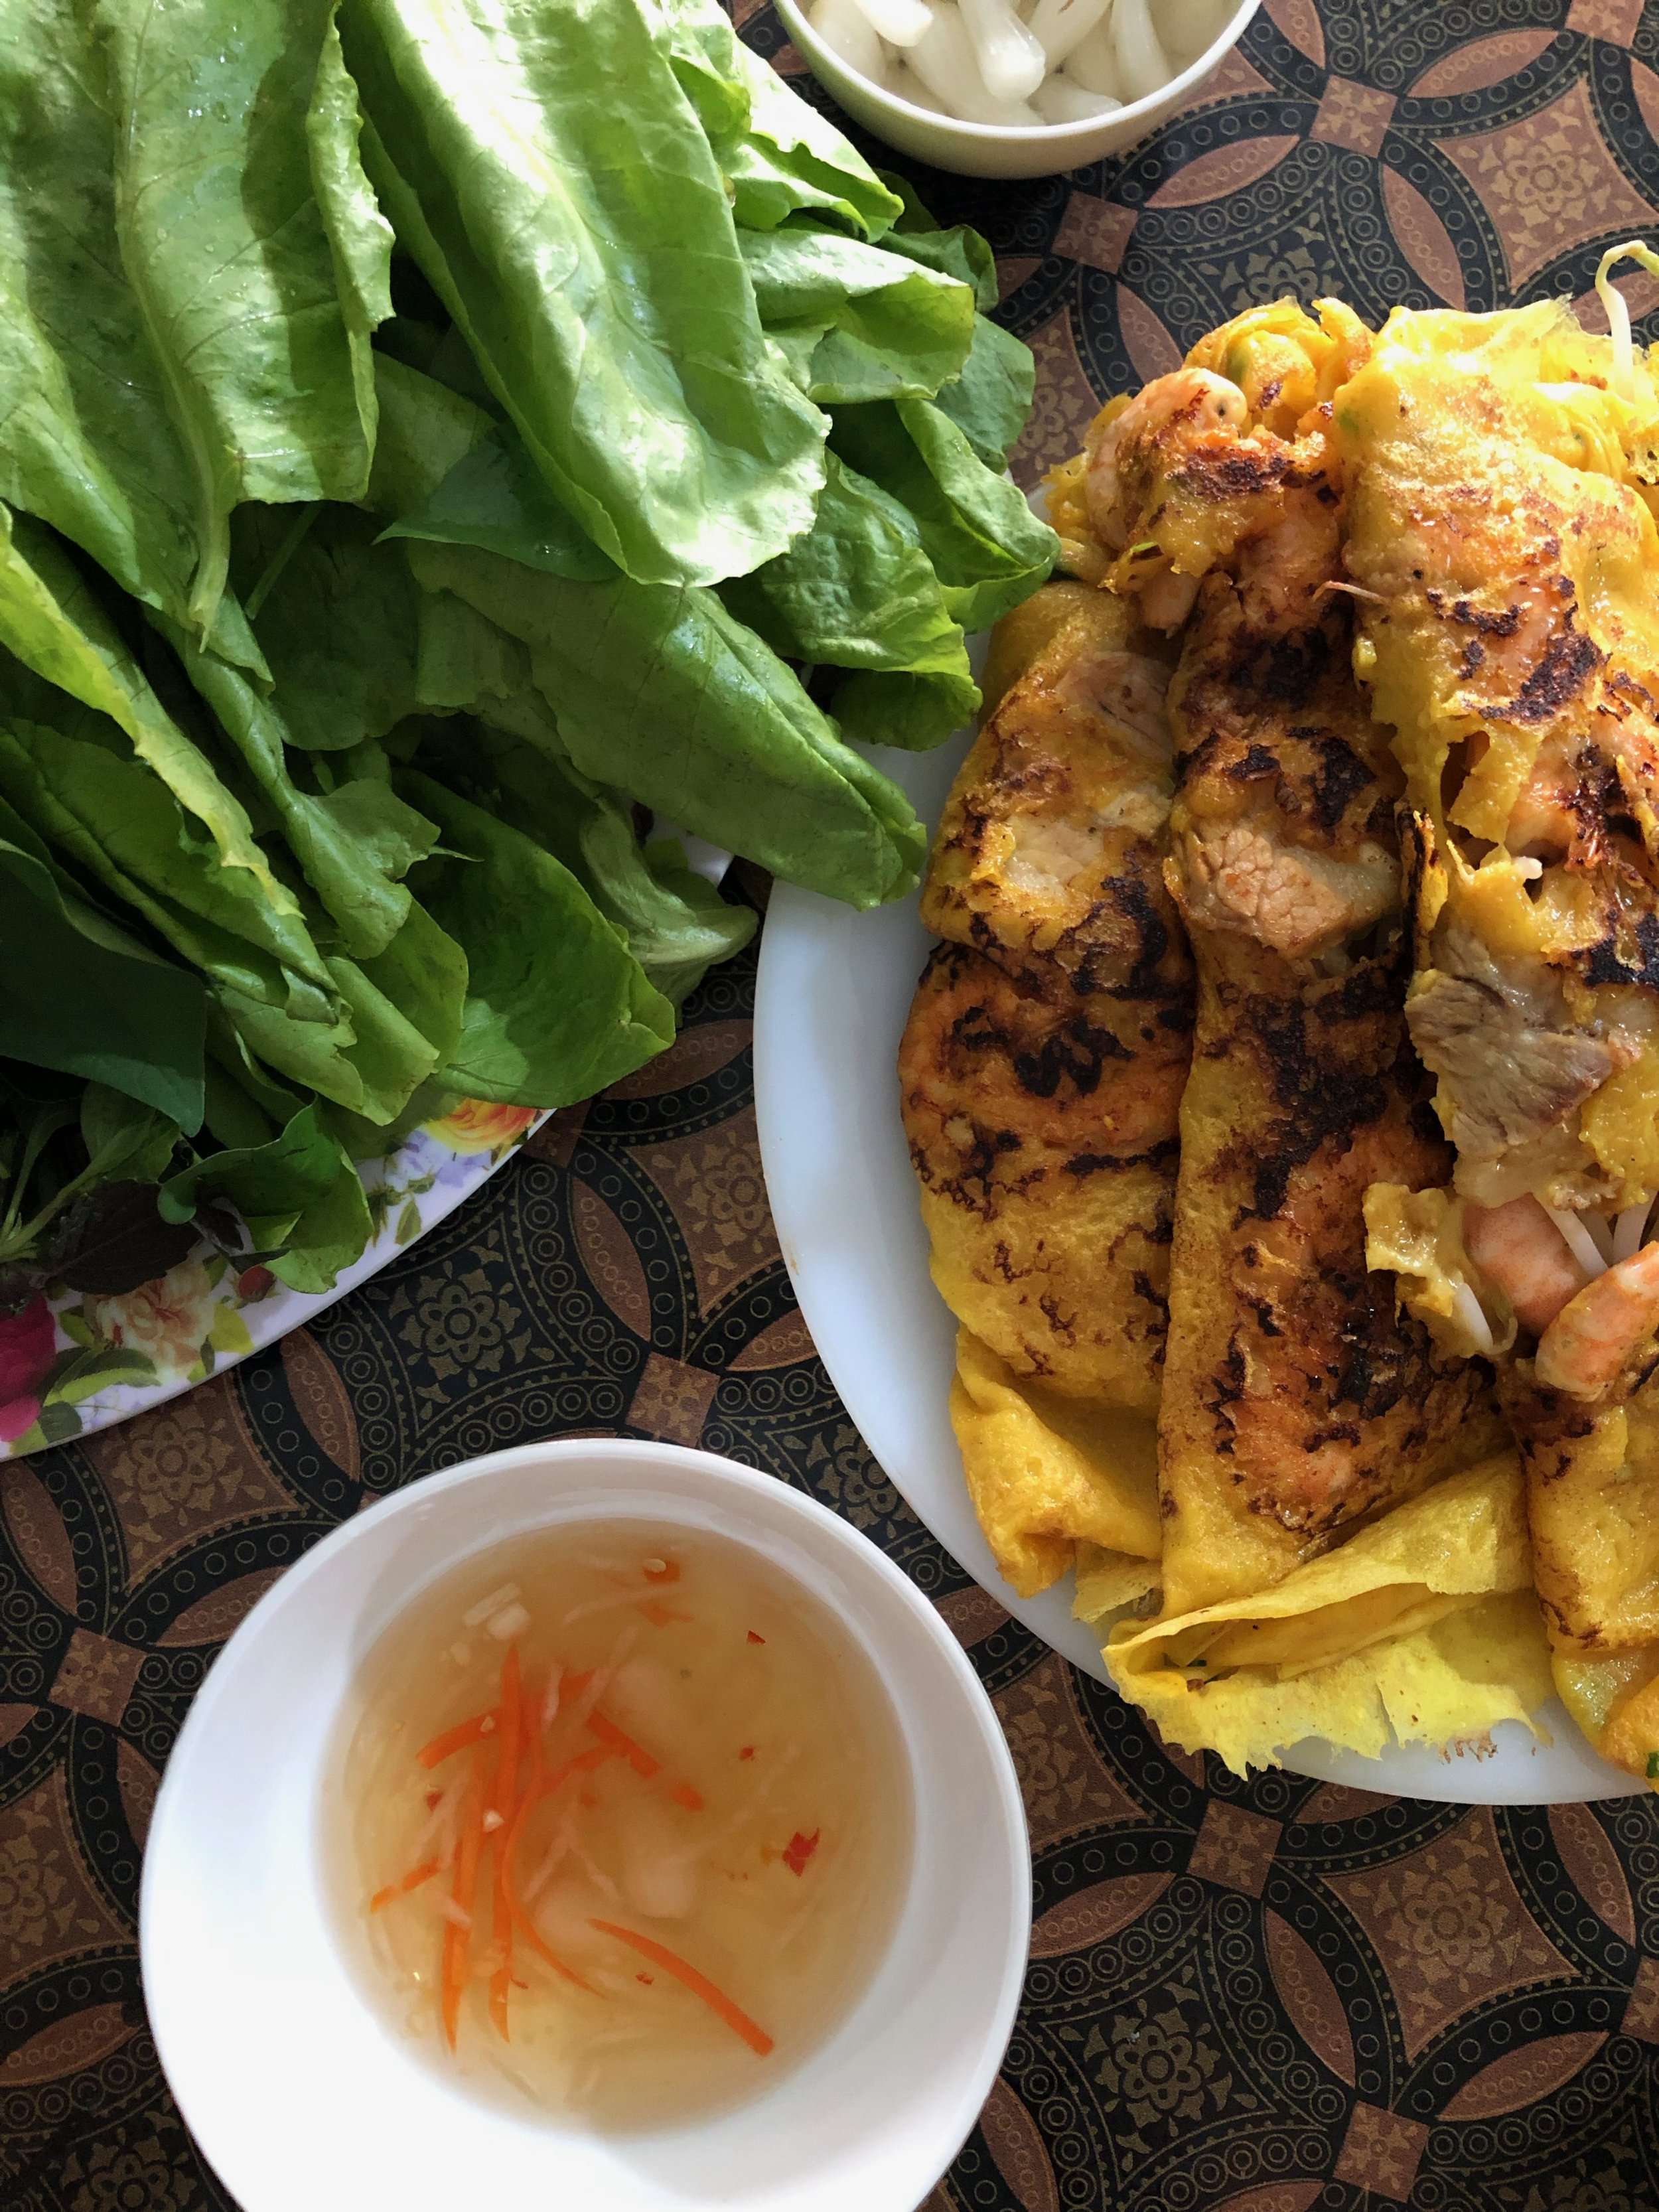 Banh Xeo - Savory Vietnamese Crepe